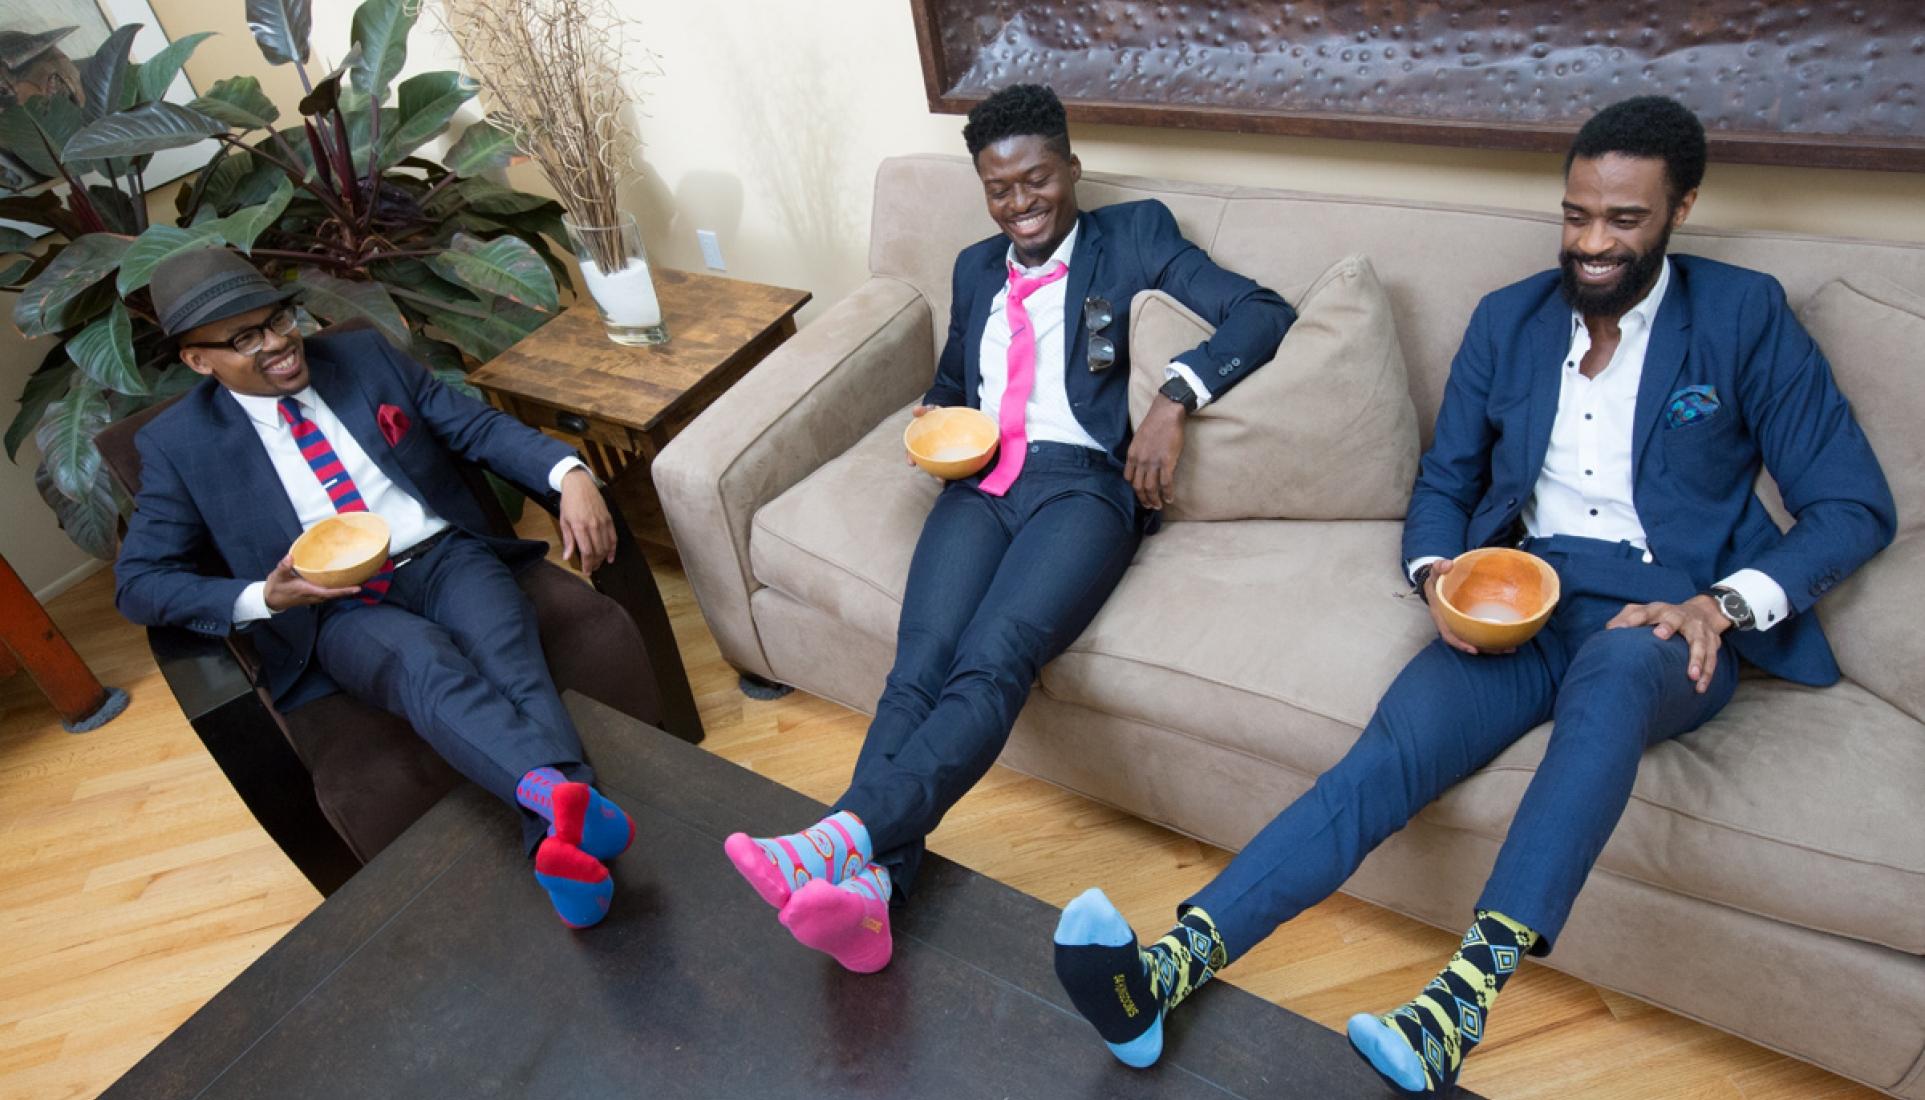 Mens colorful socks 54kingdoms coptic soles lifestyle